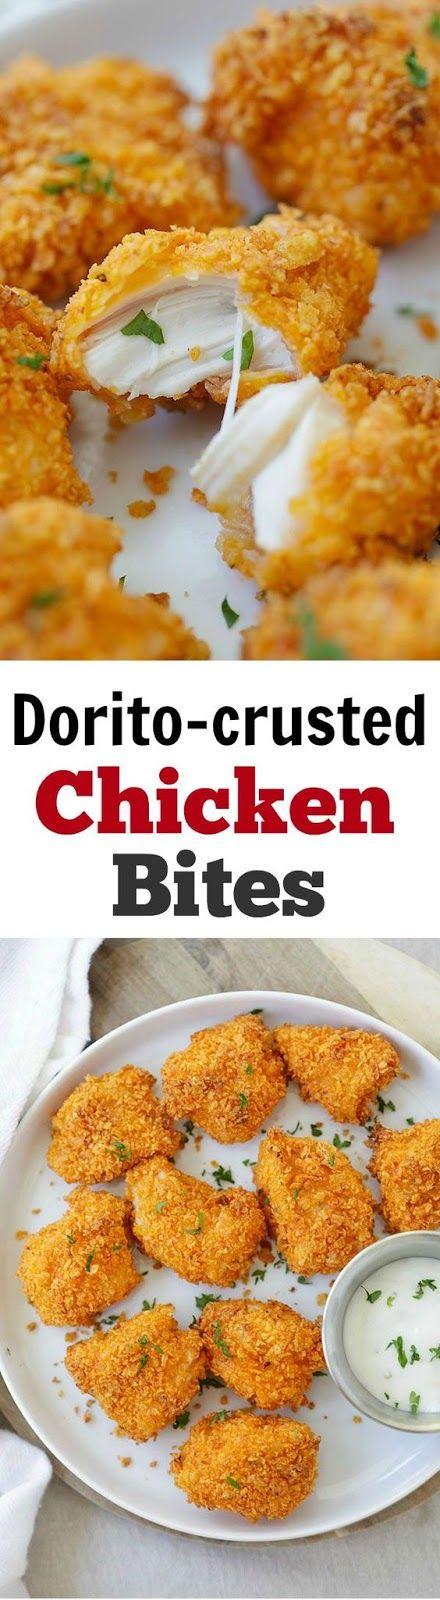 Tortilla Chip-crusted Chicken Bites